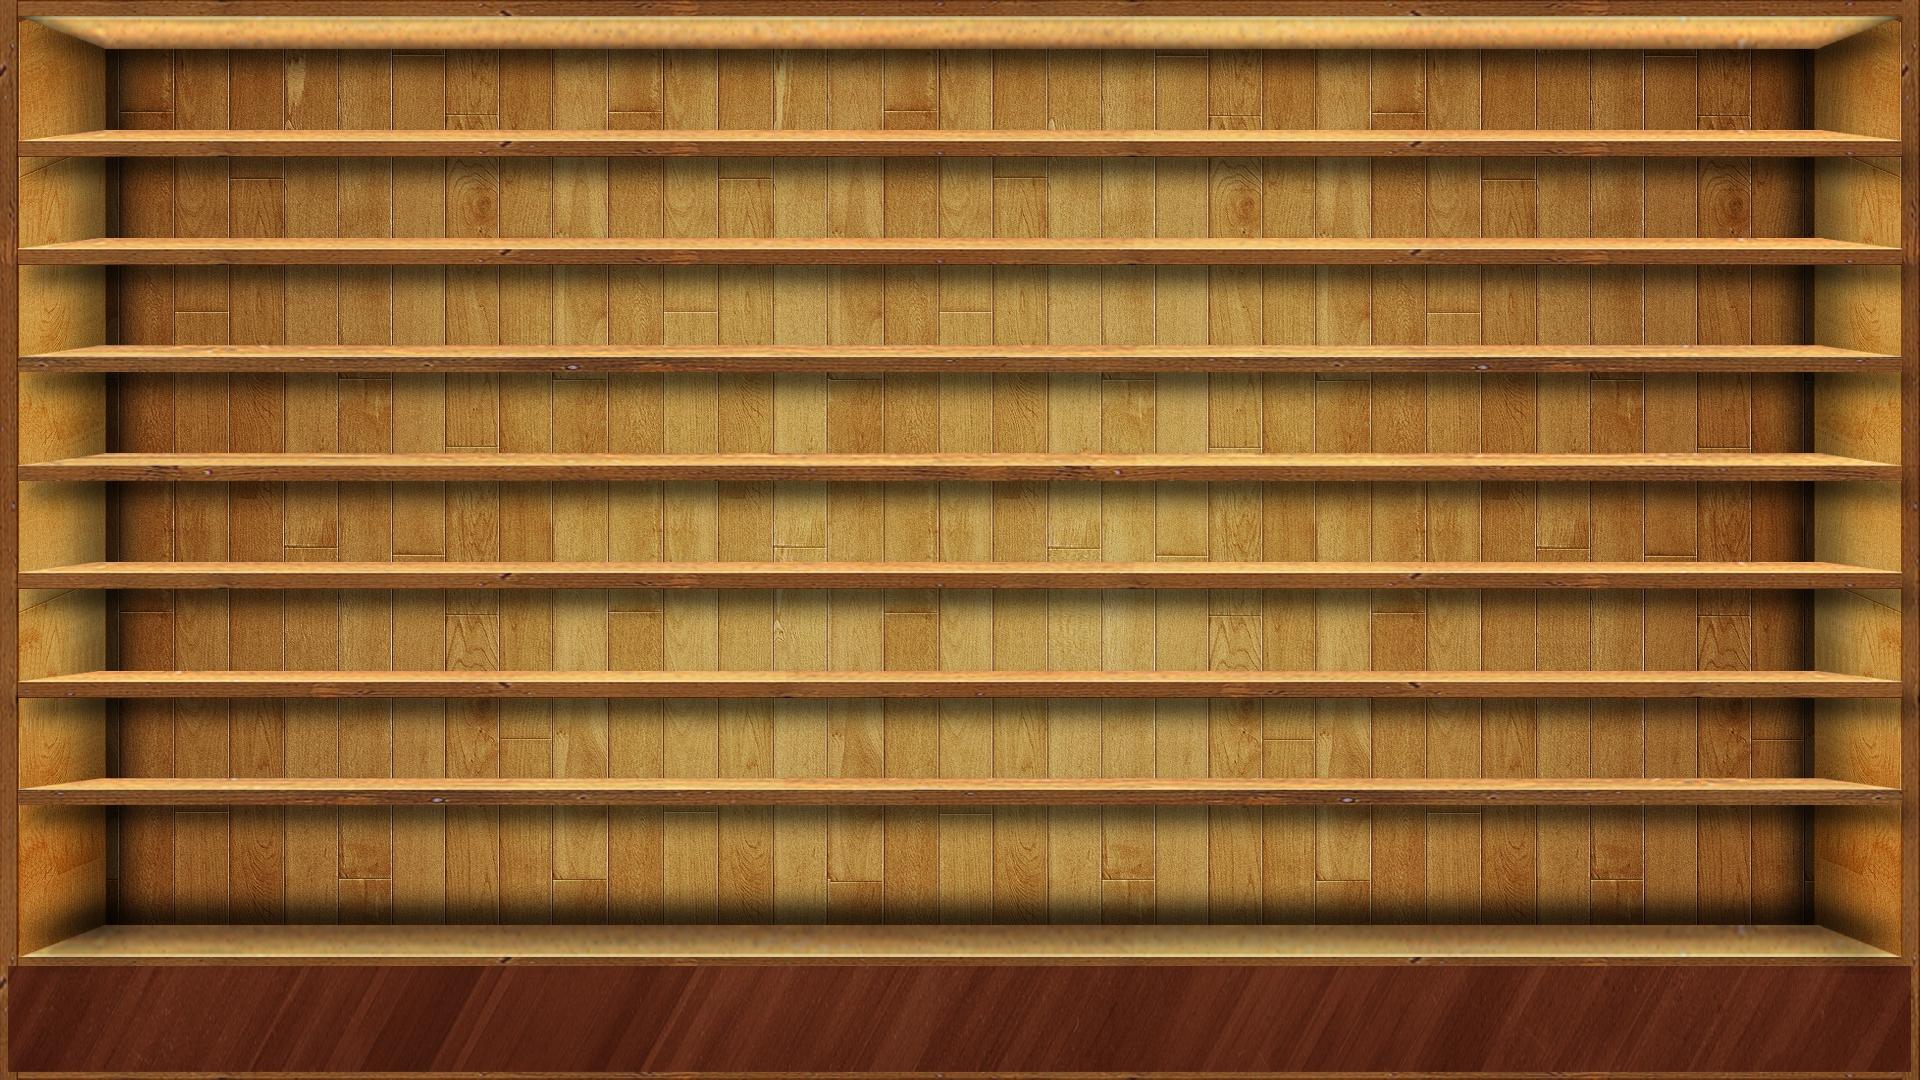 wood shelves wallpapersamirpa.deviantart it's time to tidy